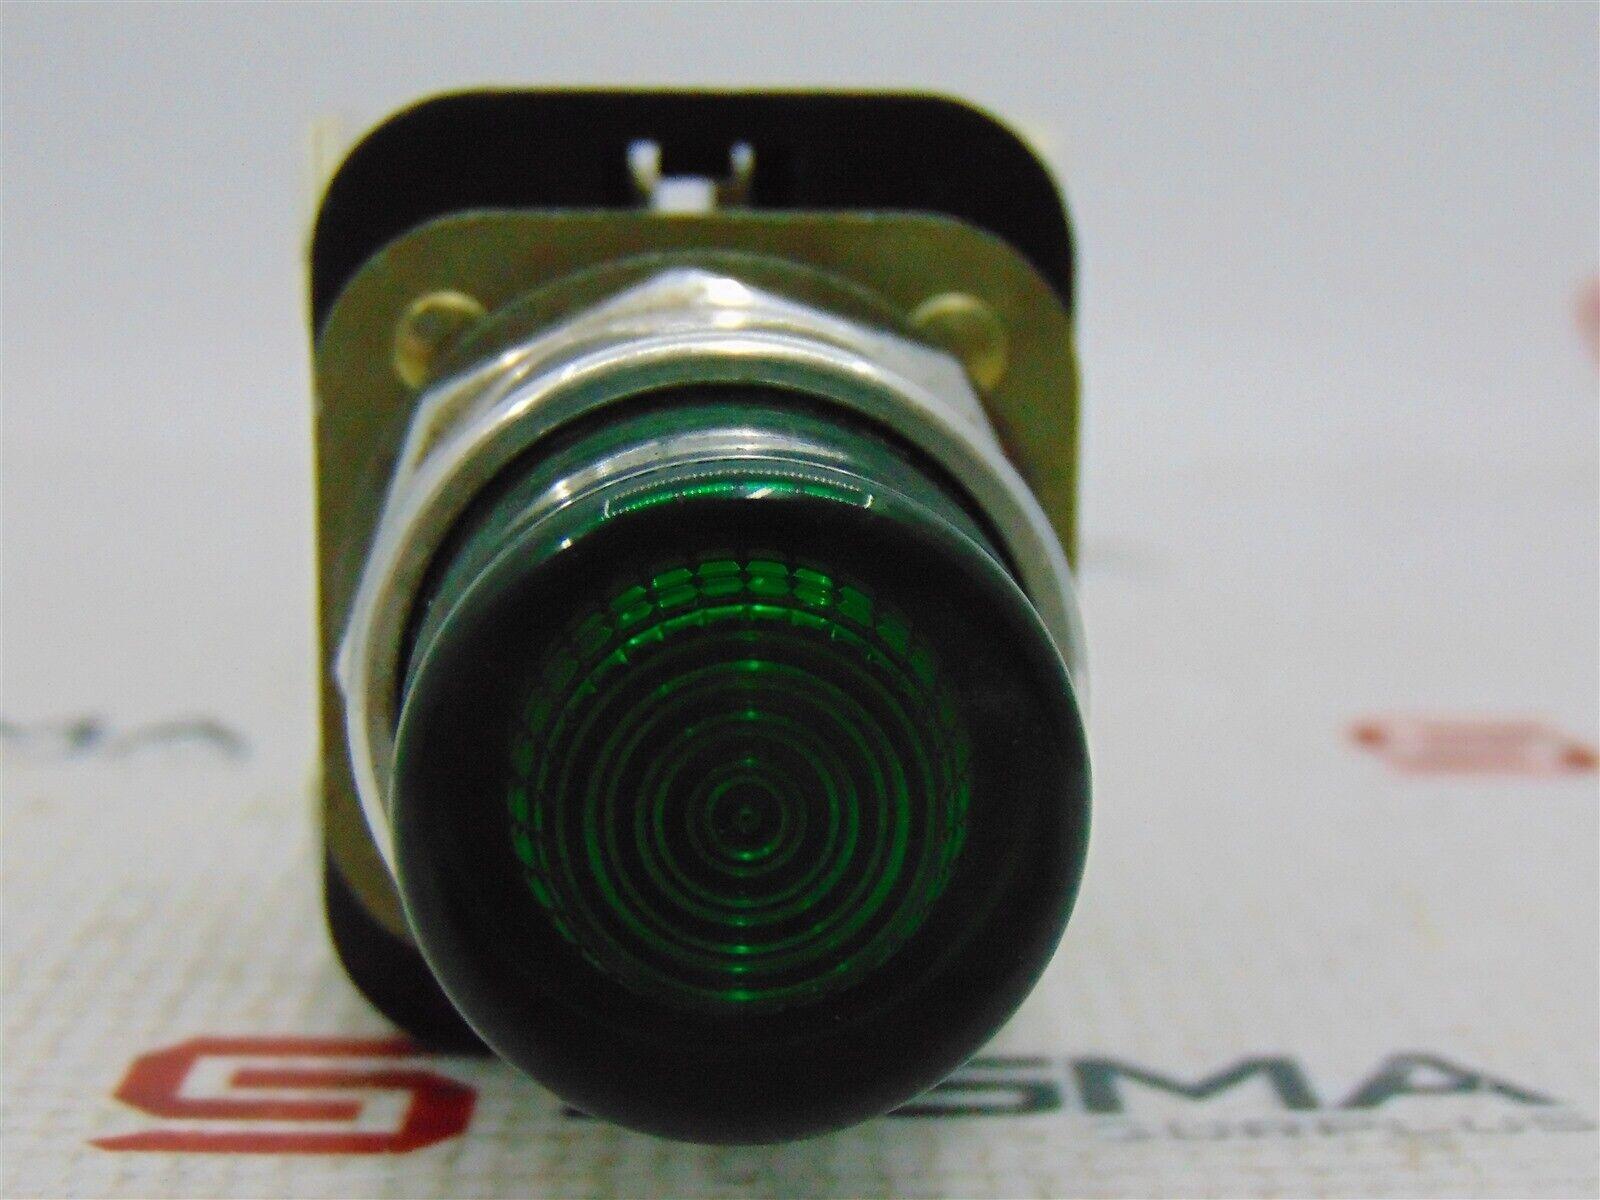 Allen-Bradley 800T-QB24 Green Illum. Pushbutton Ser T w/ 800T-XA Block Ser D